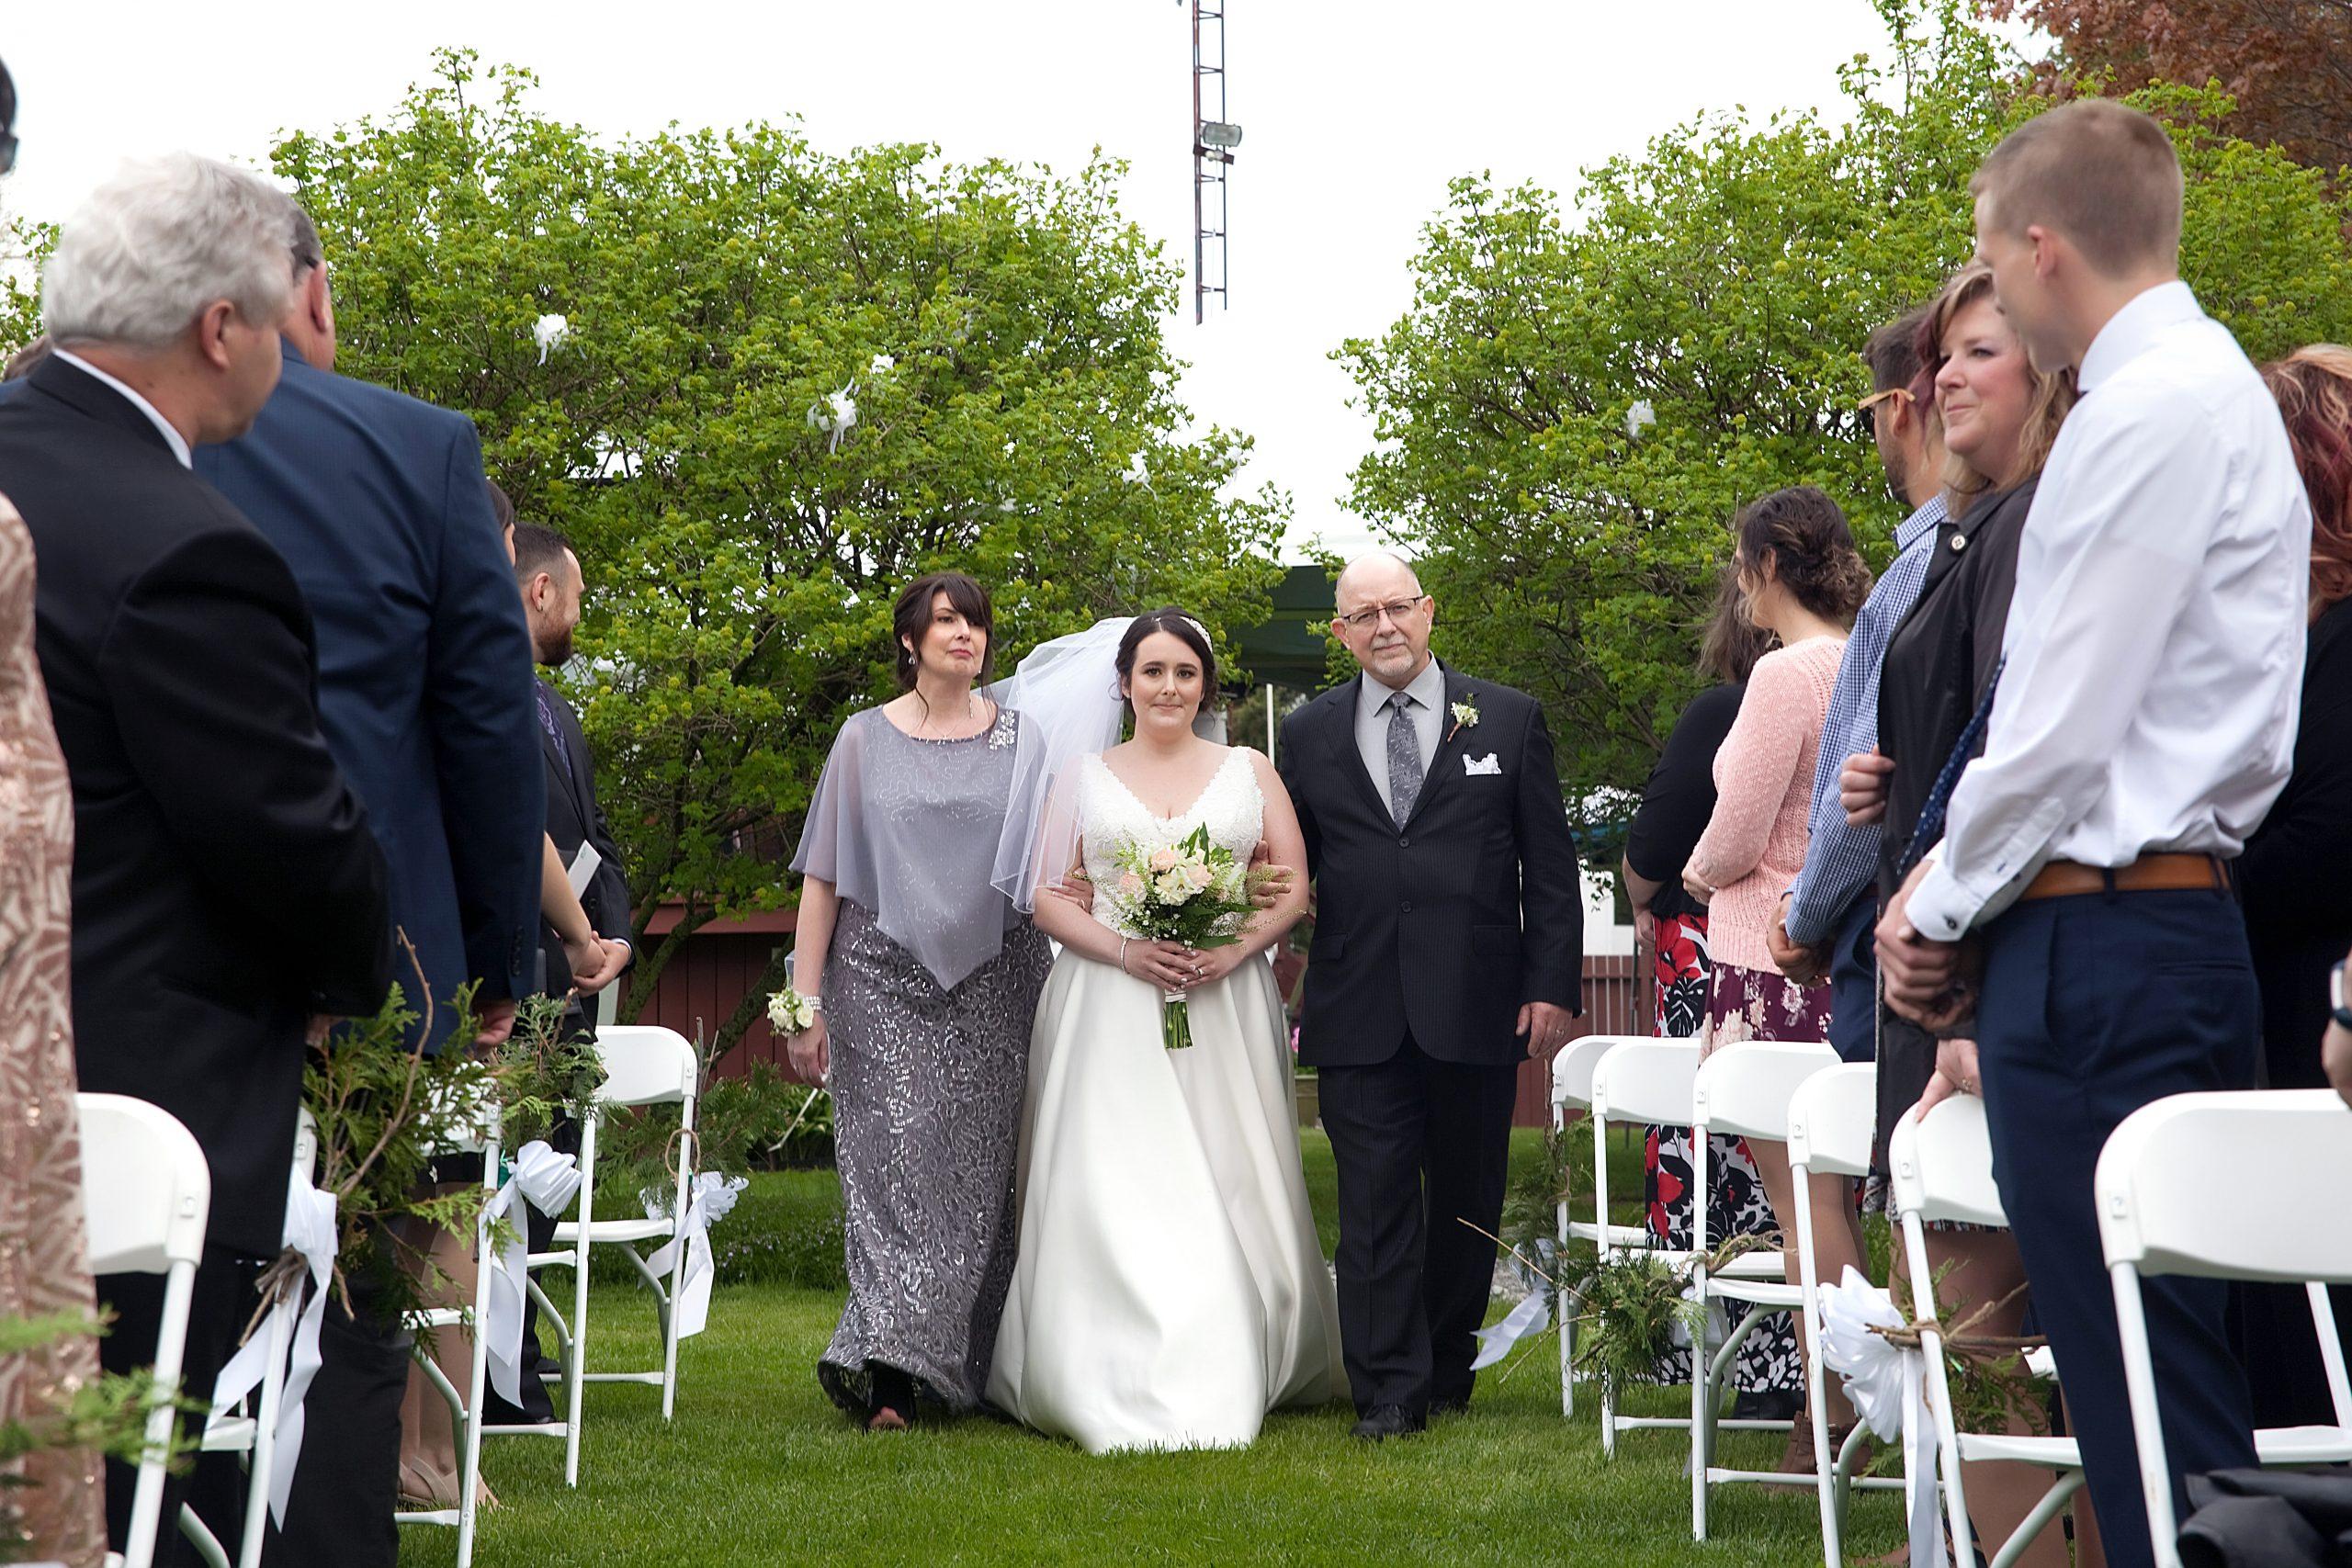 bride down the aisle backyard wedding ceremony